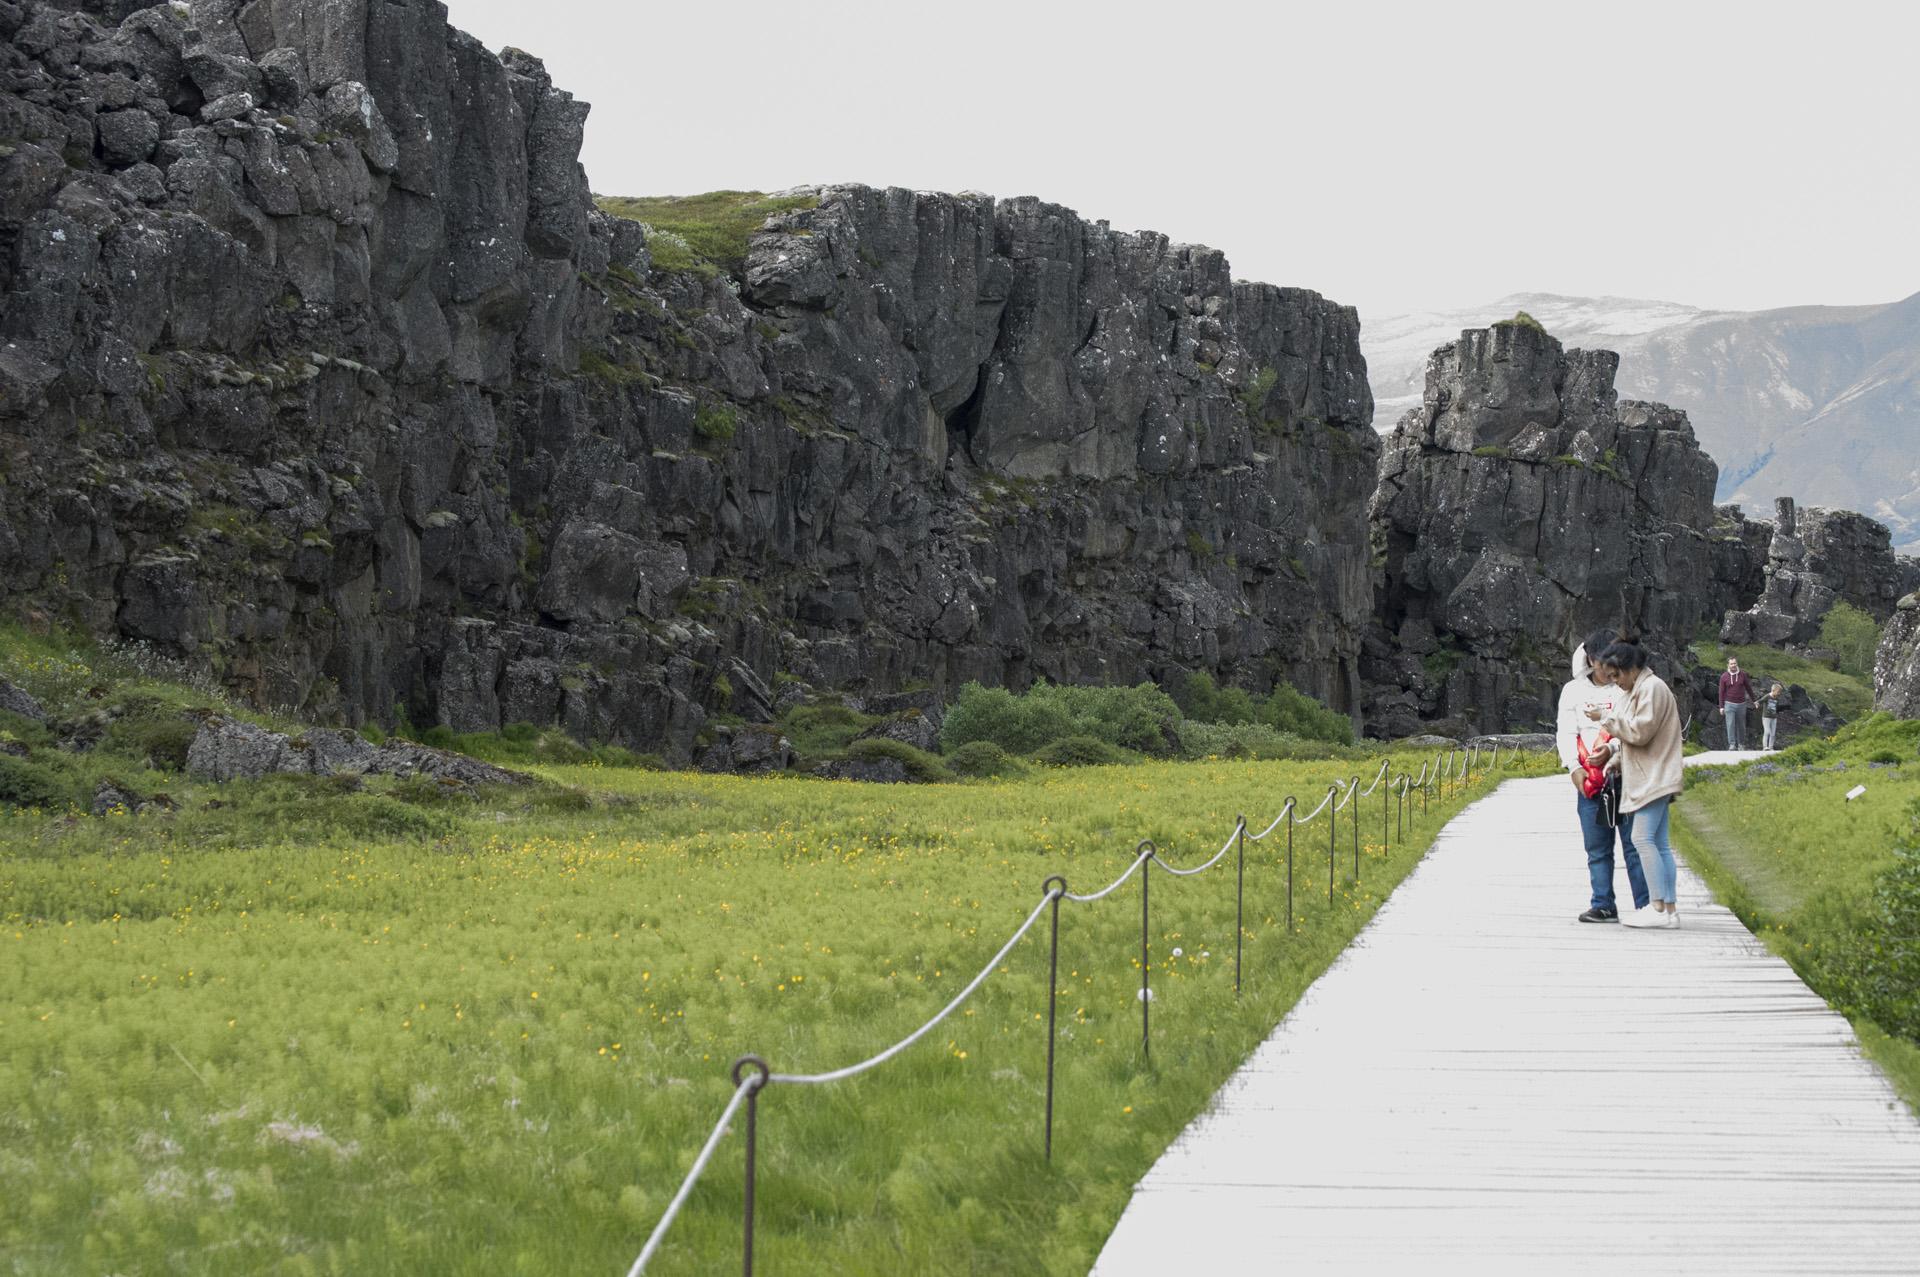 Walking along the rift valley in the Mid-Atlantic Ridge, Þingvellir National Park, Suðurland region, Iceland.